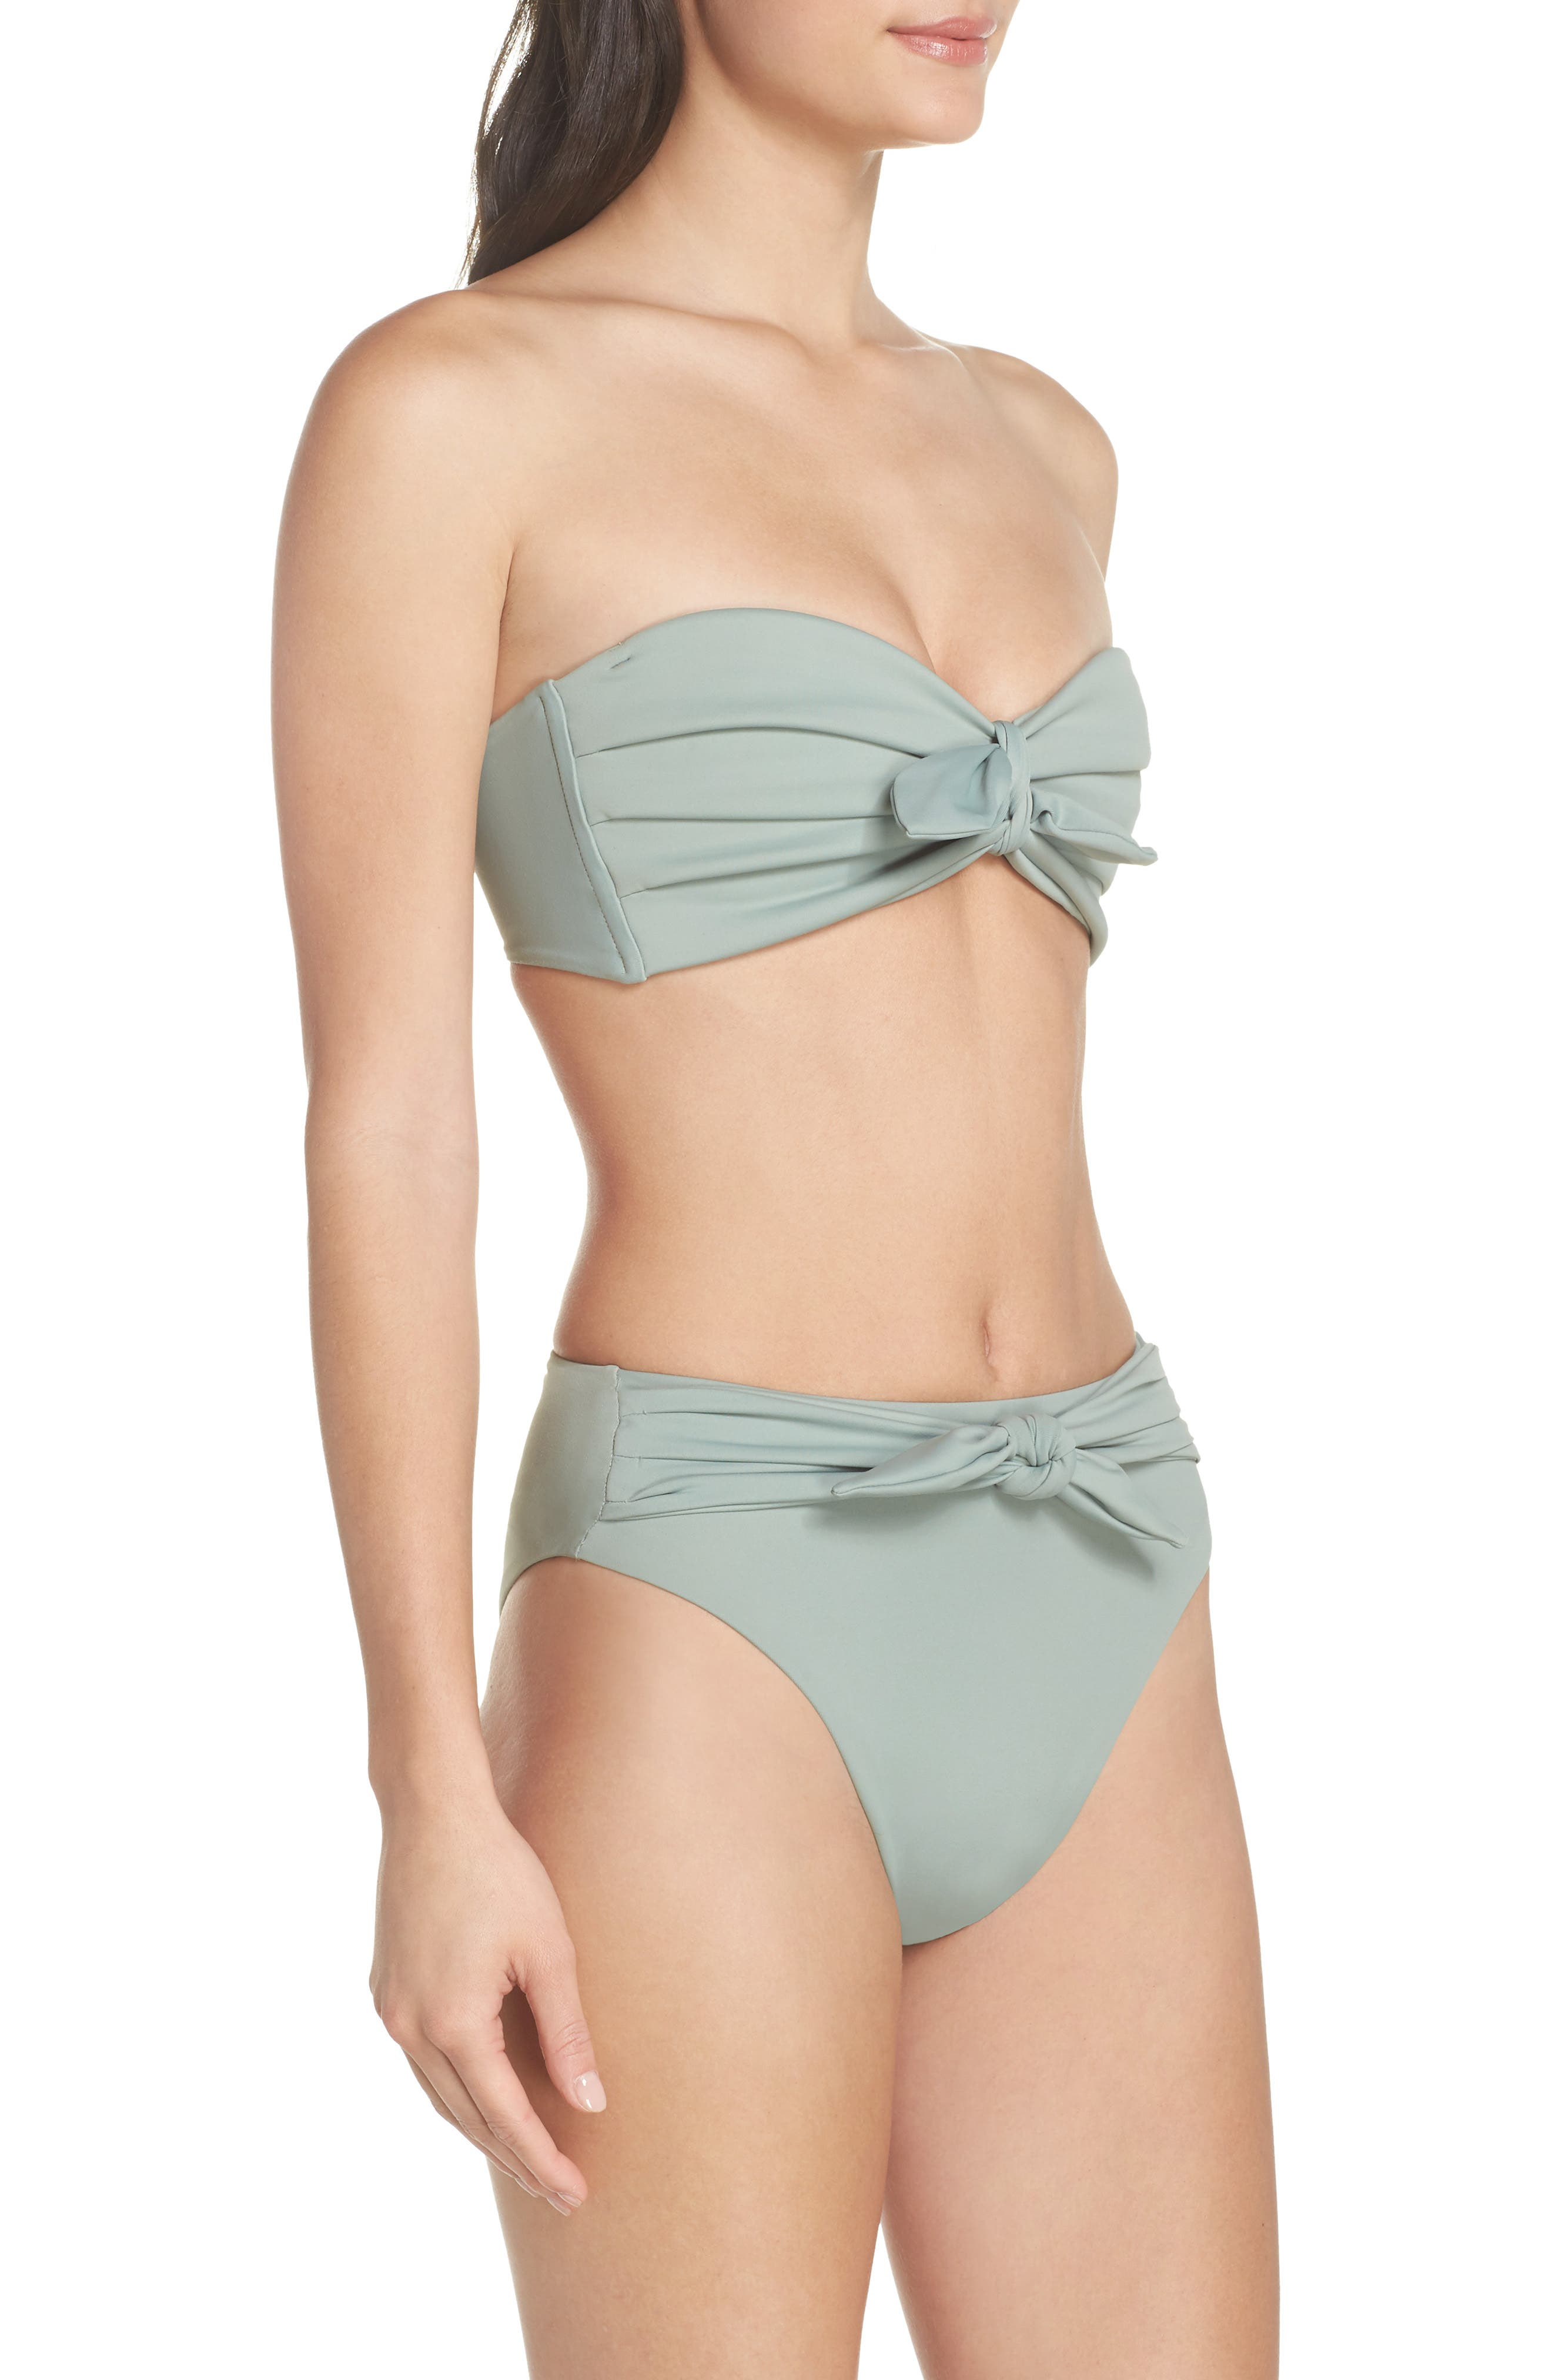 Paula Tie-Up Bikini Bottoms,                             Alternate thumbnail 7, color,                             Pistache Green